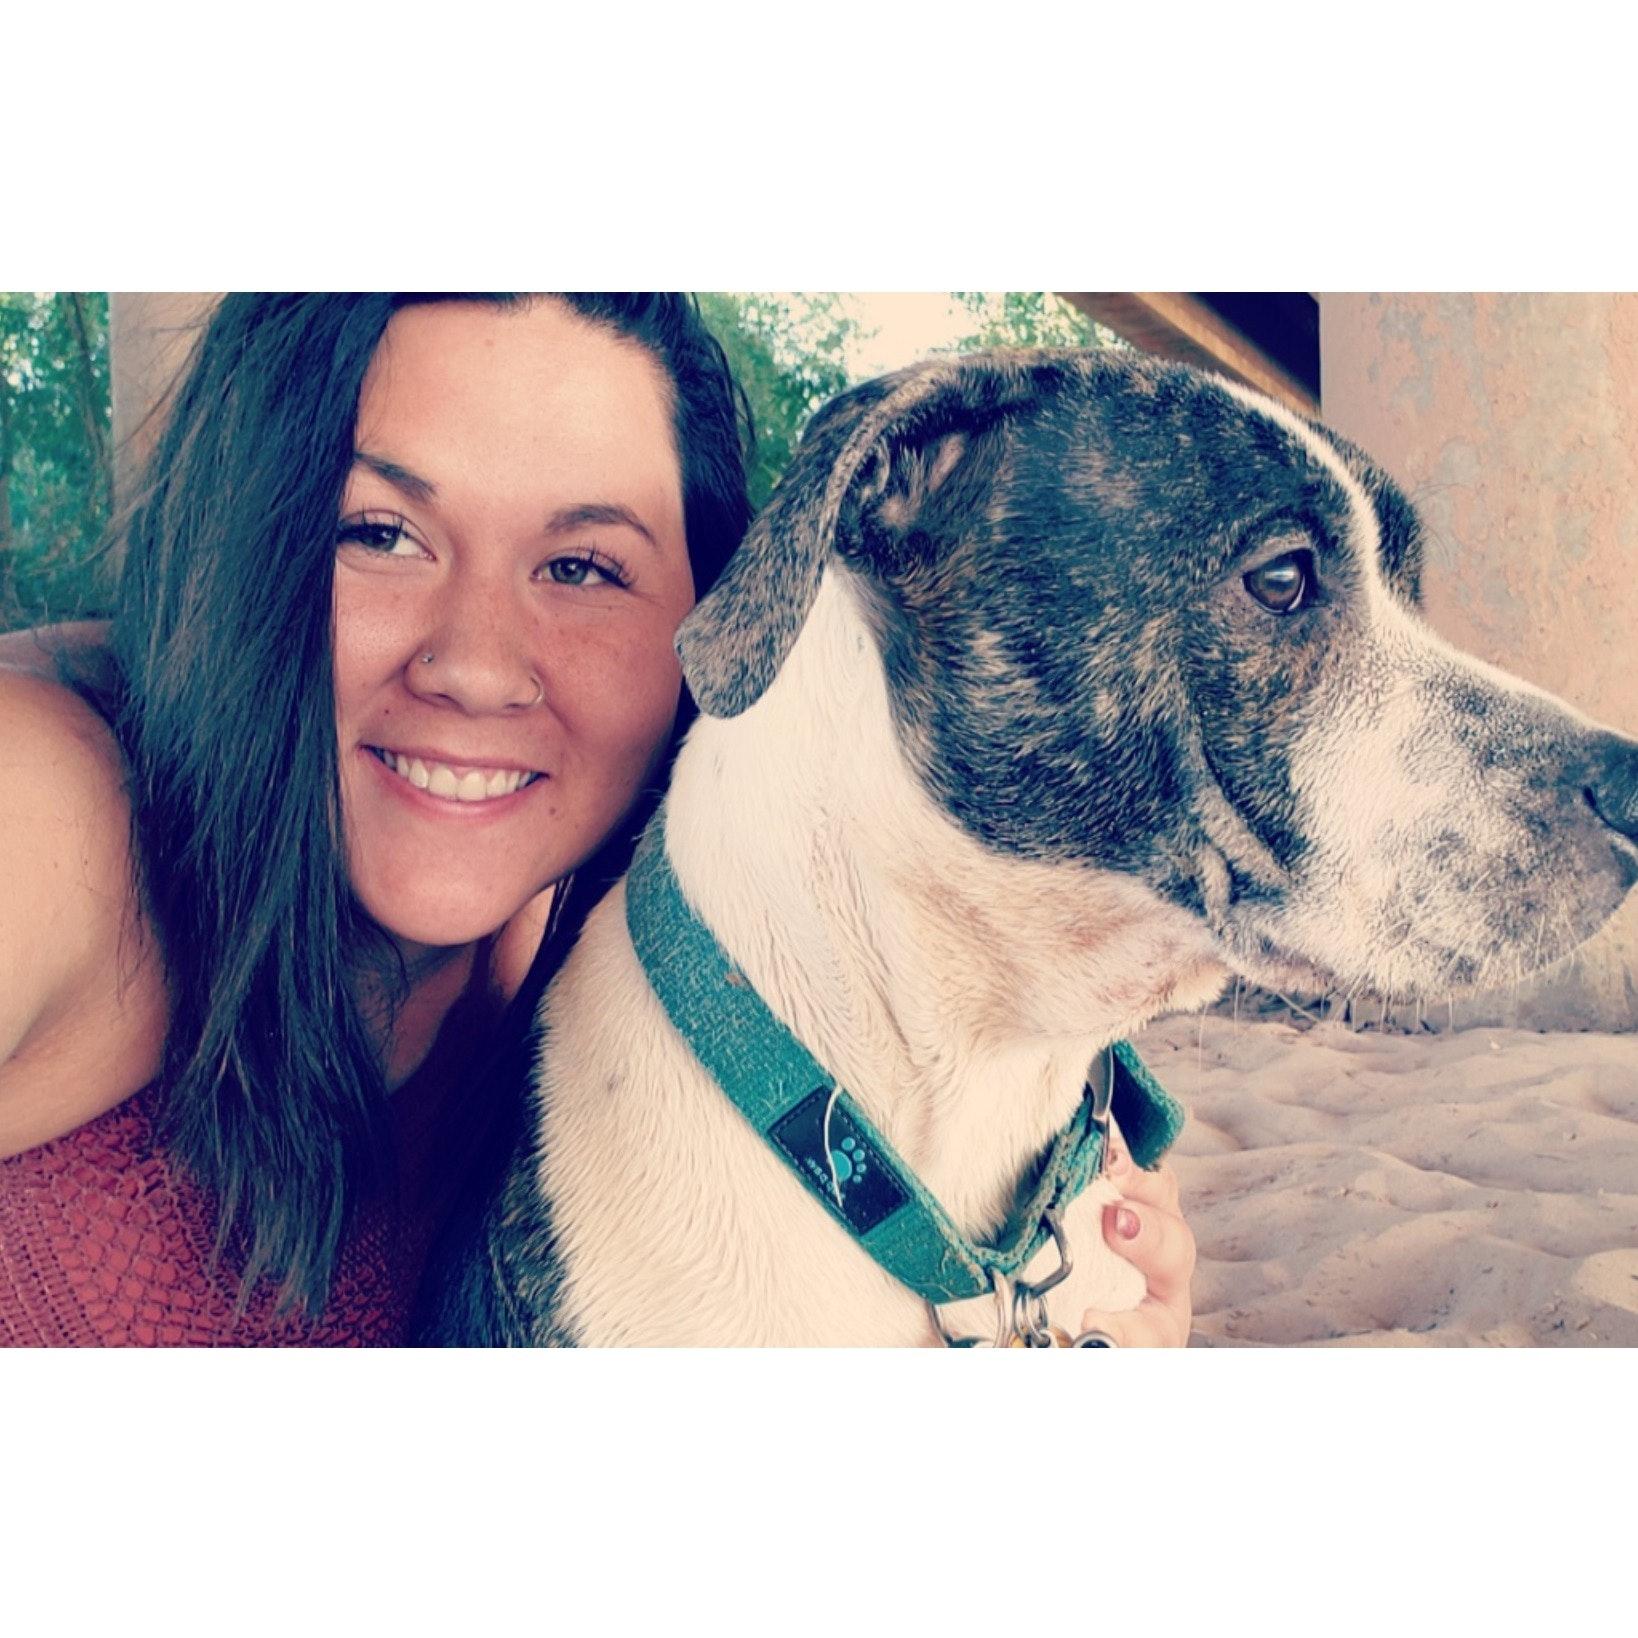 Breeanna's dog day care